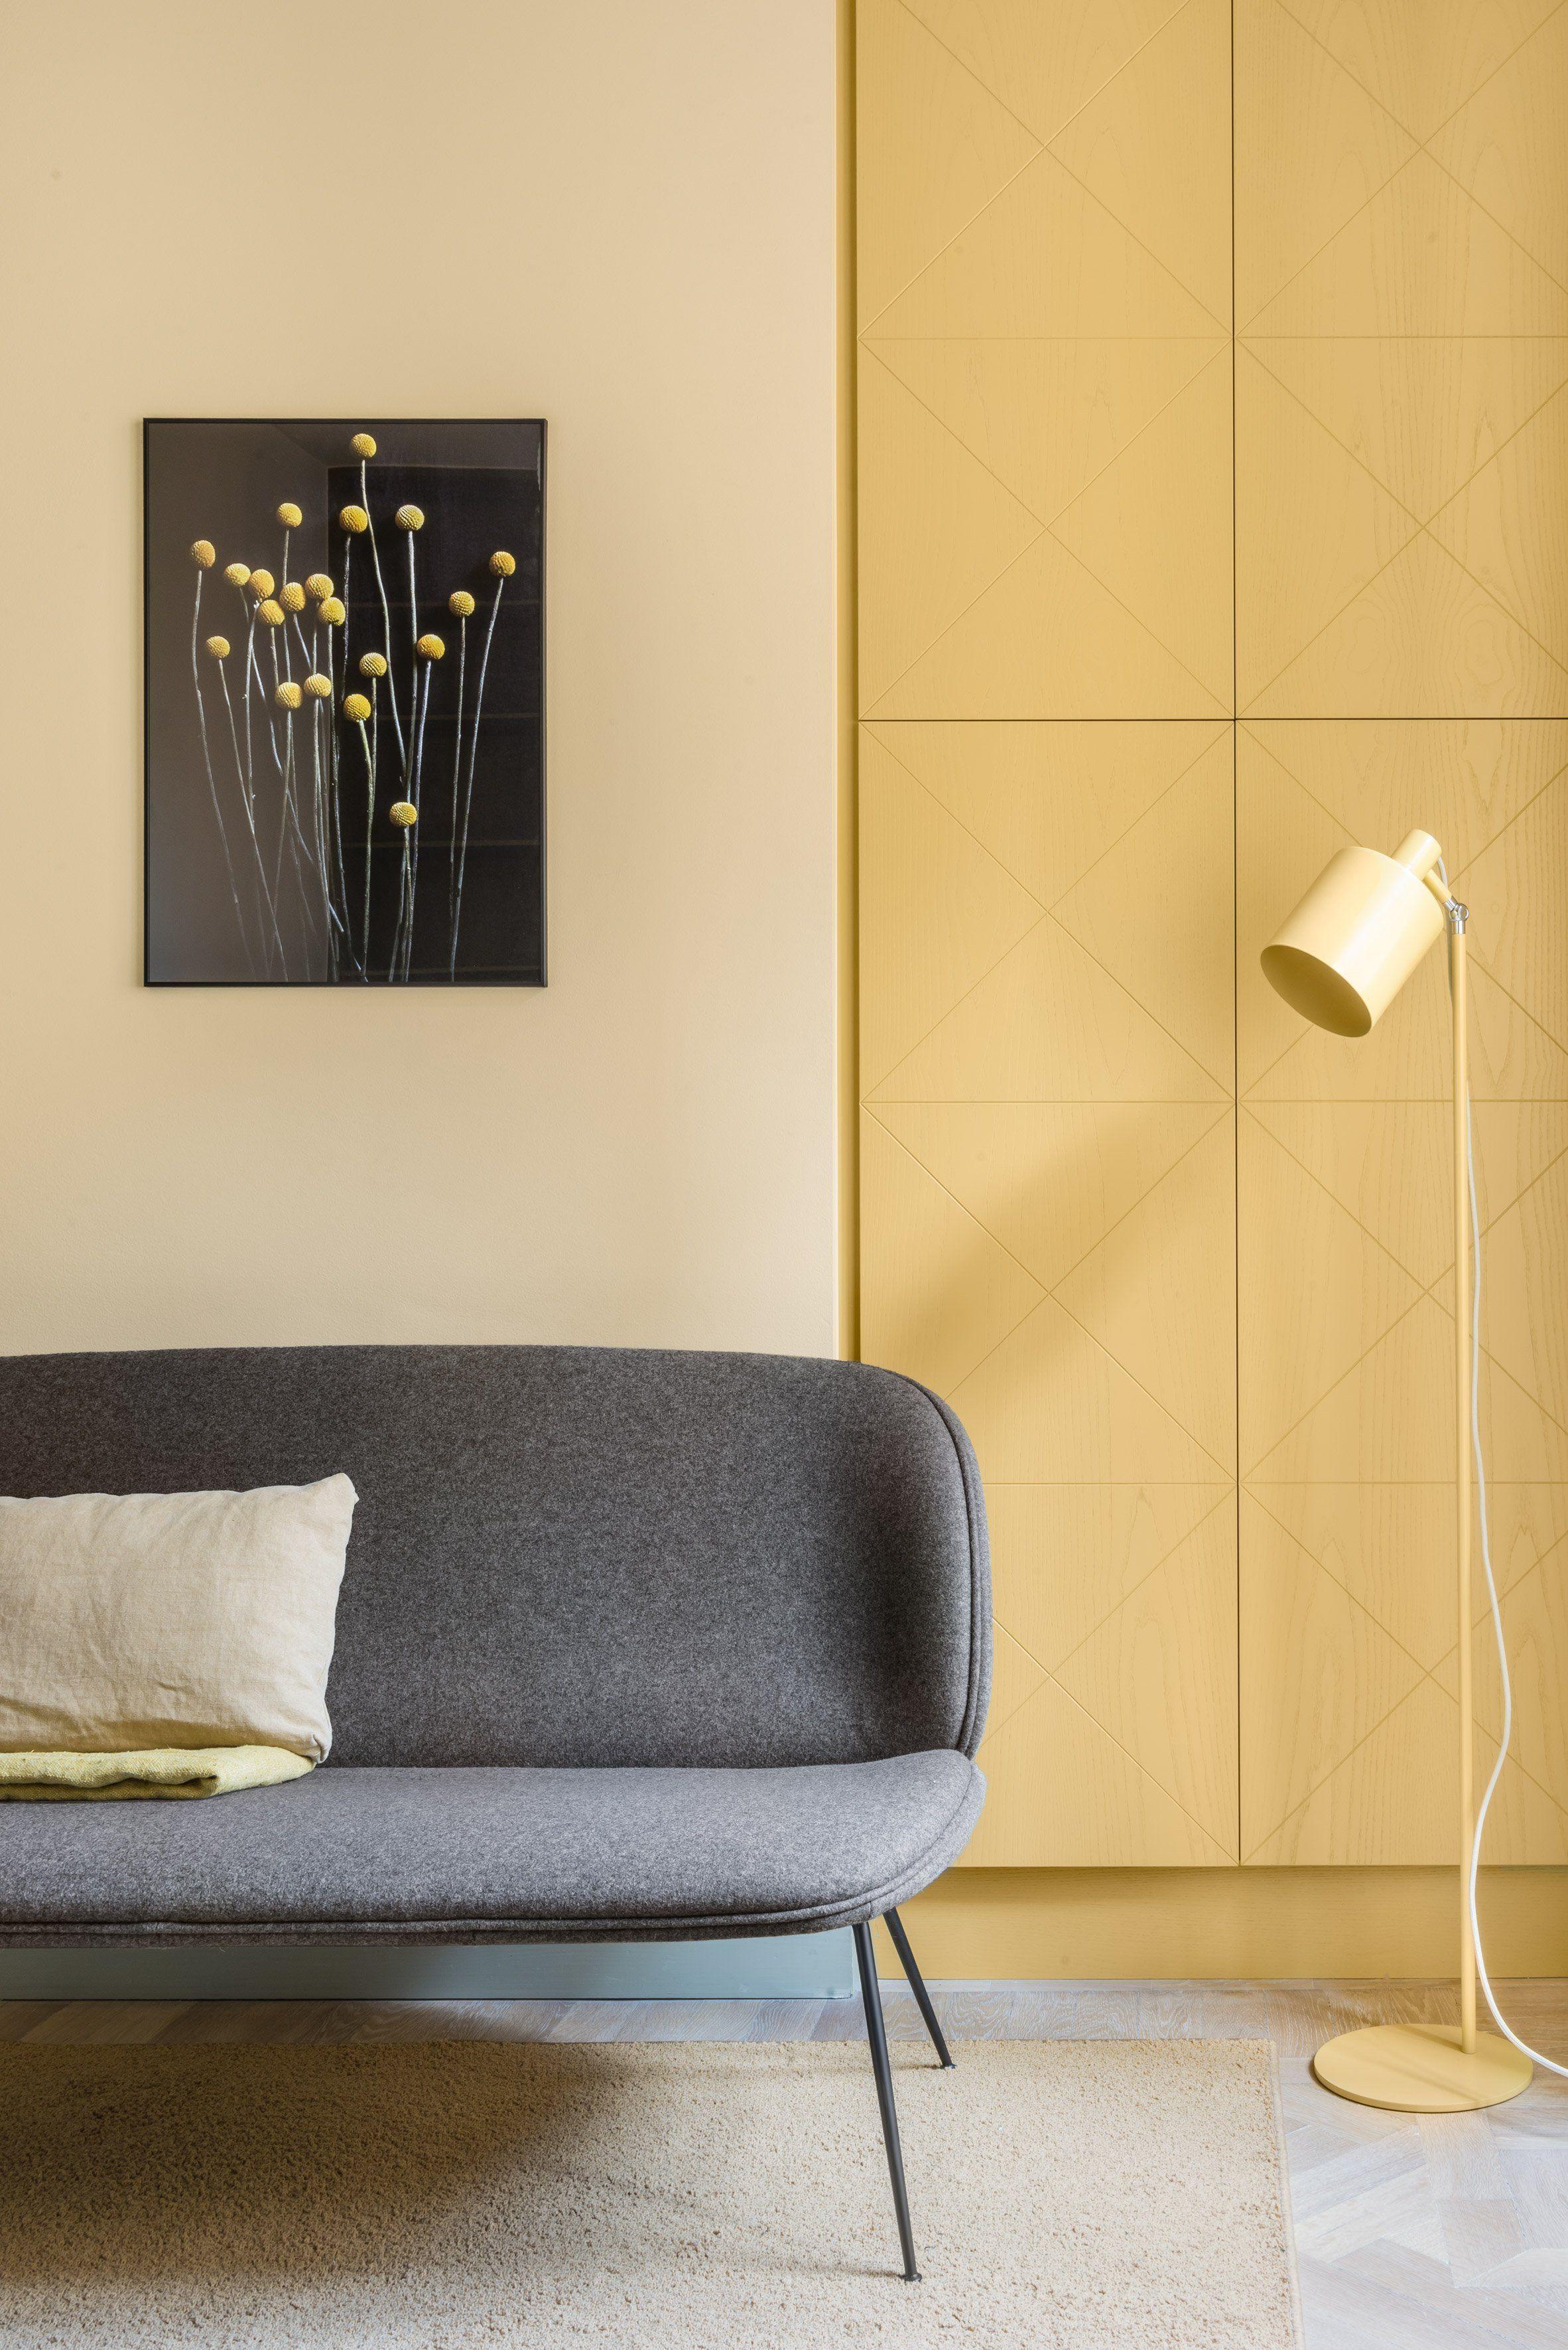 Gorgeous stockholm home by note design studio interiors interiordesign interiordesignideas homedecor decor renovation interiordesigner livingroom